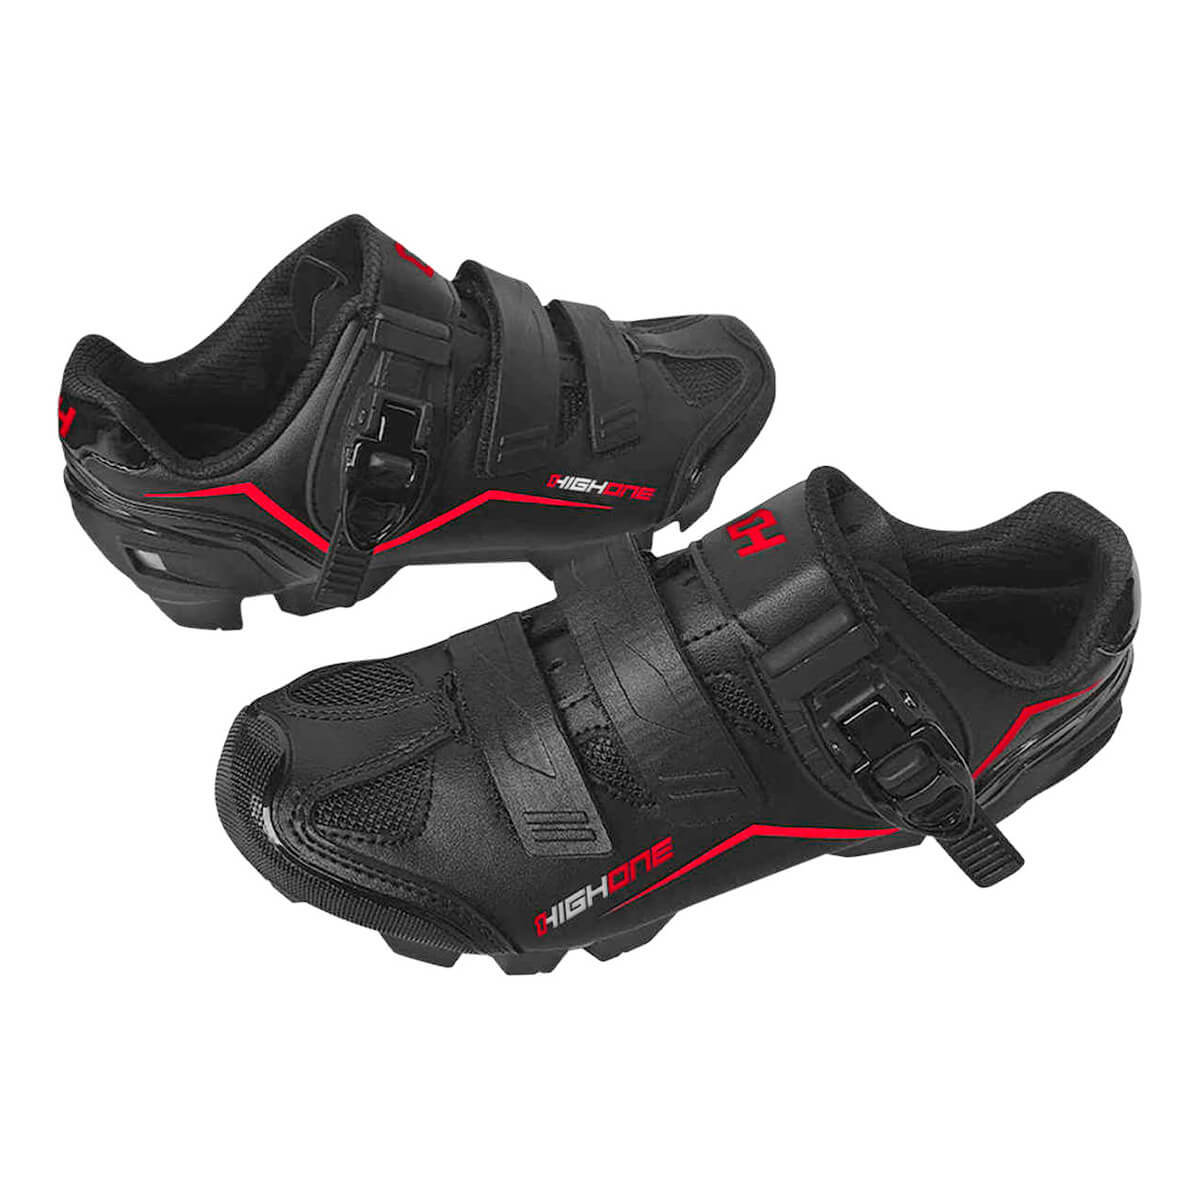 Sapatilha High One Feet Mtb Ciclismo Bike Vermelho